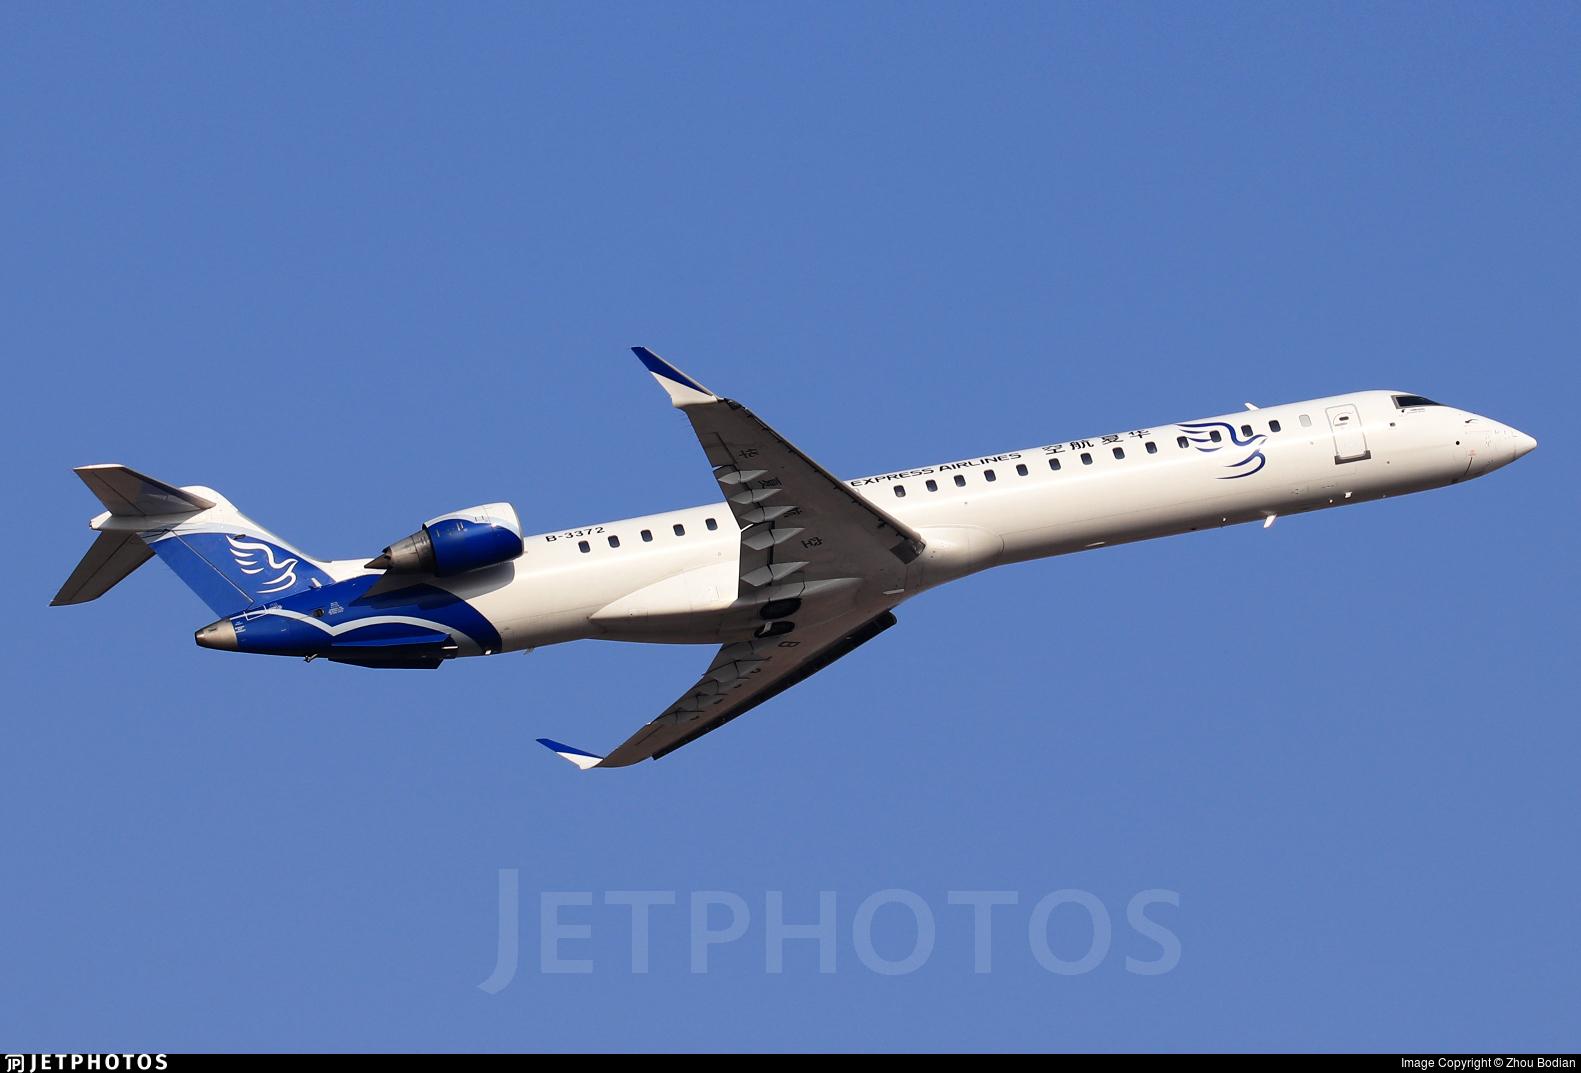 B-3372 - Bombardier CRJ-900LR - China Express Airlines